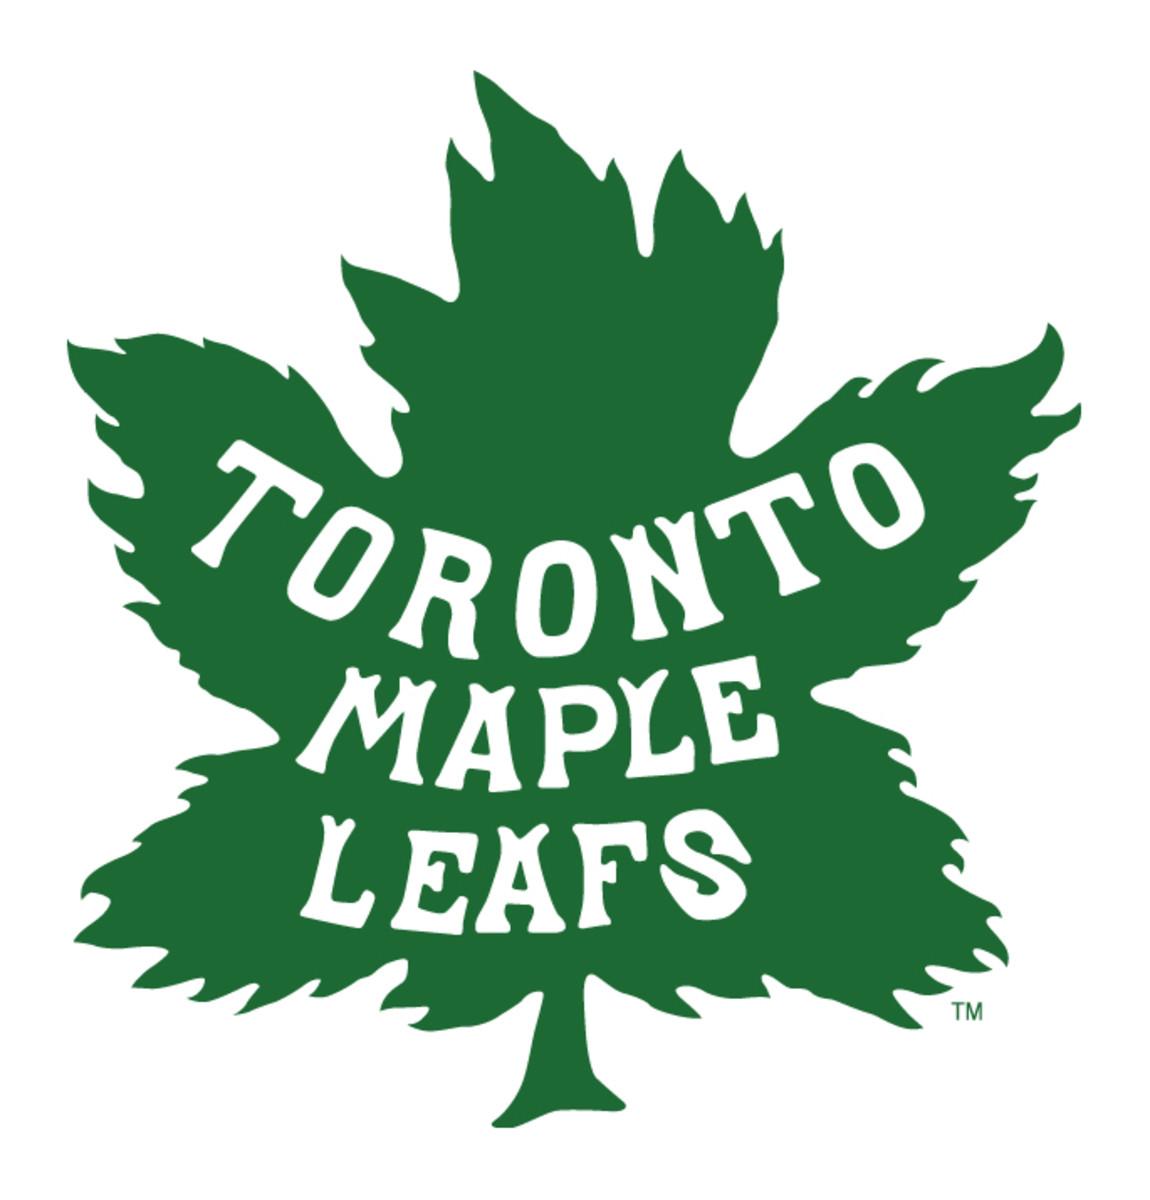 Toronto-Maple-Leafs-logo-1926-27.jpg